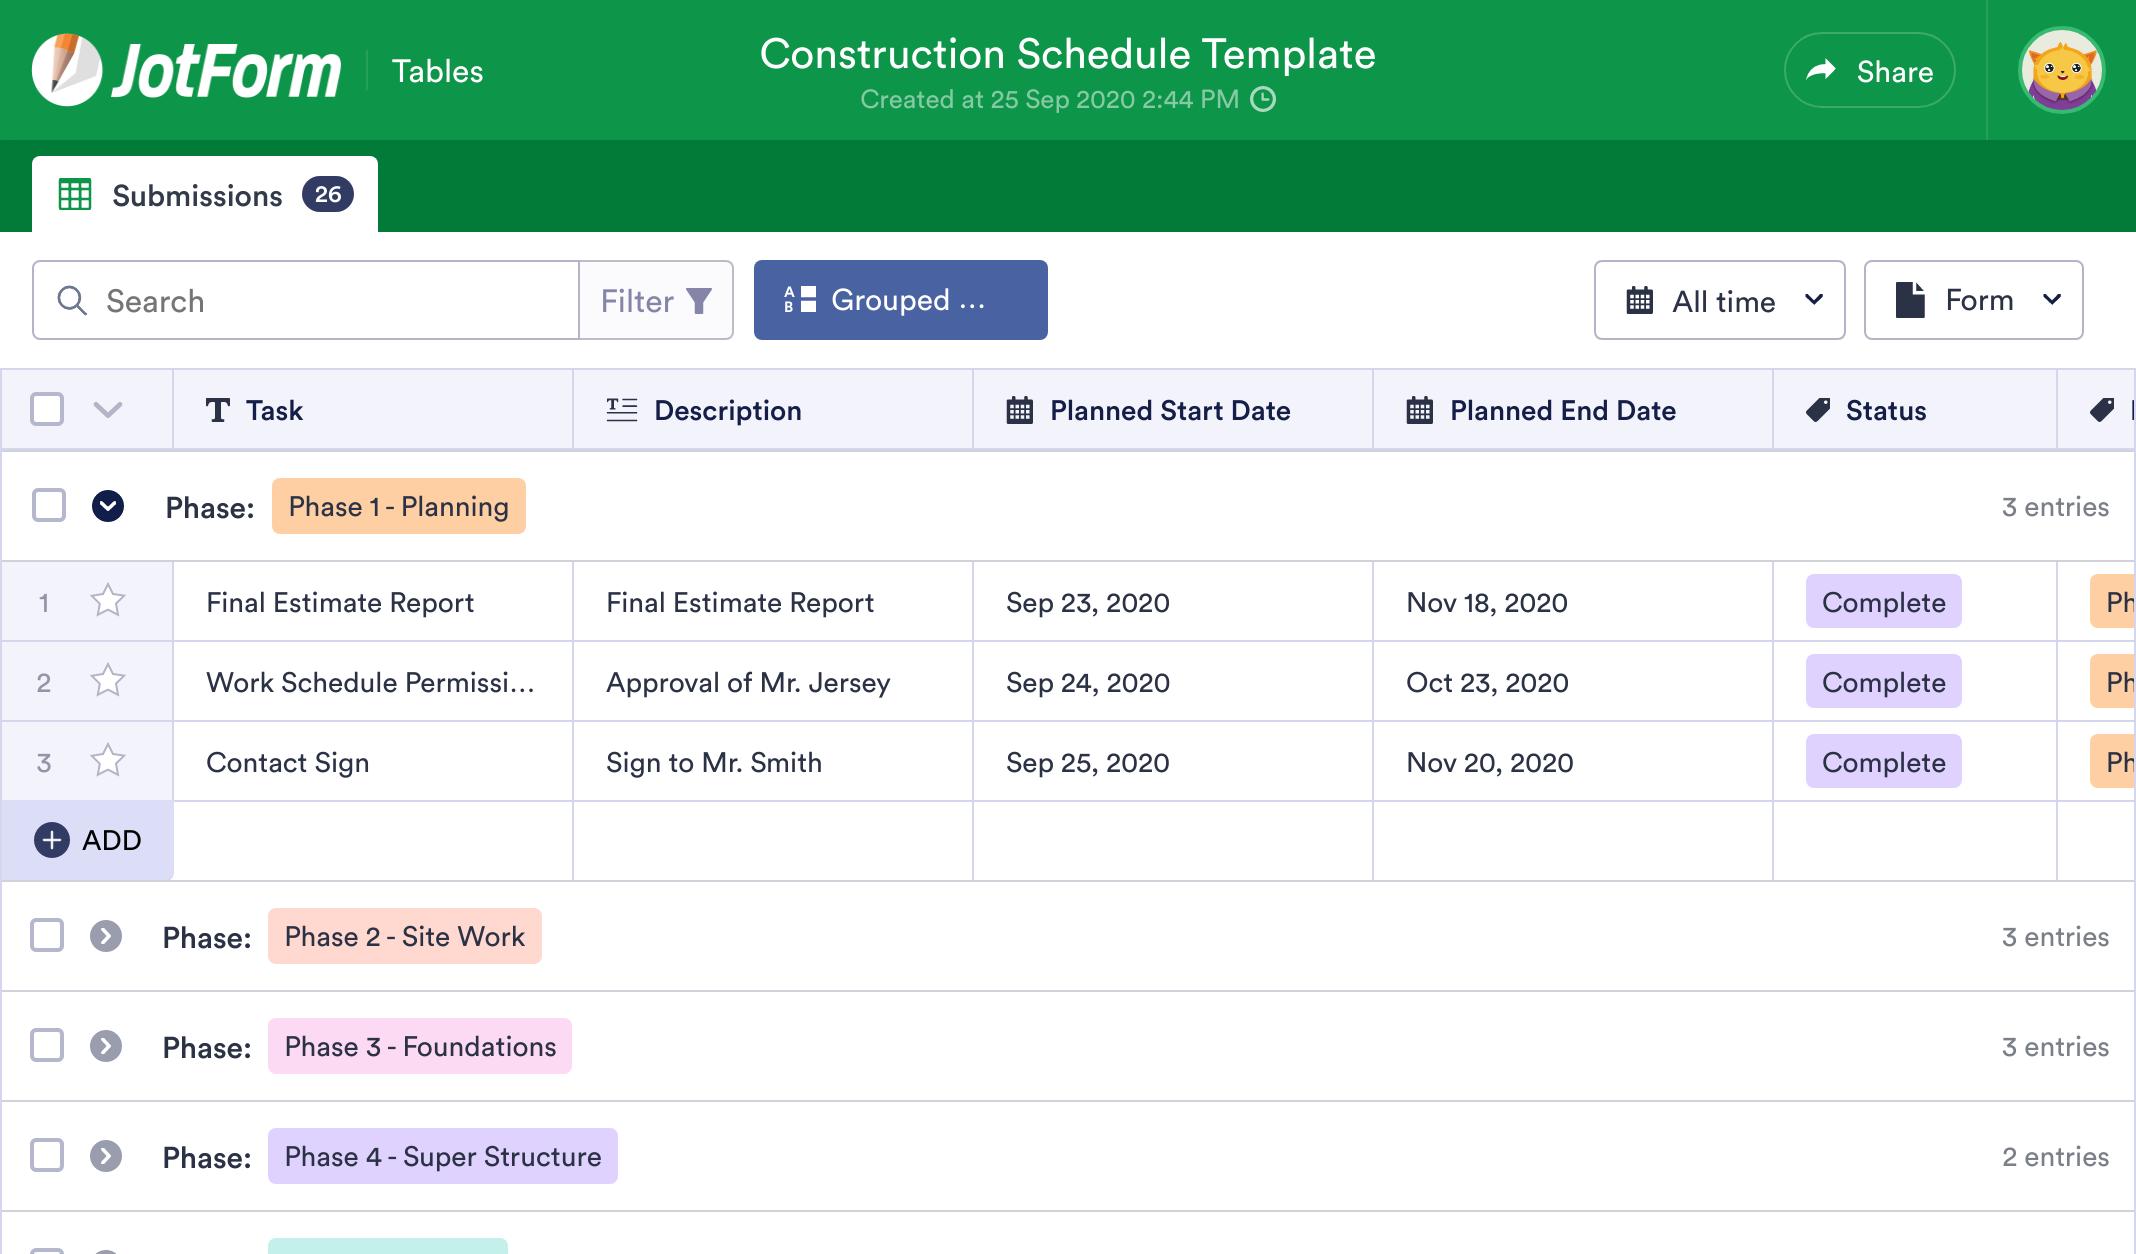 Construction Schedule Template